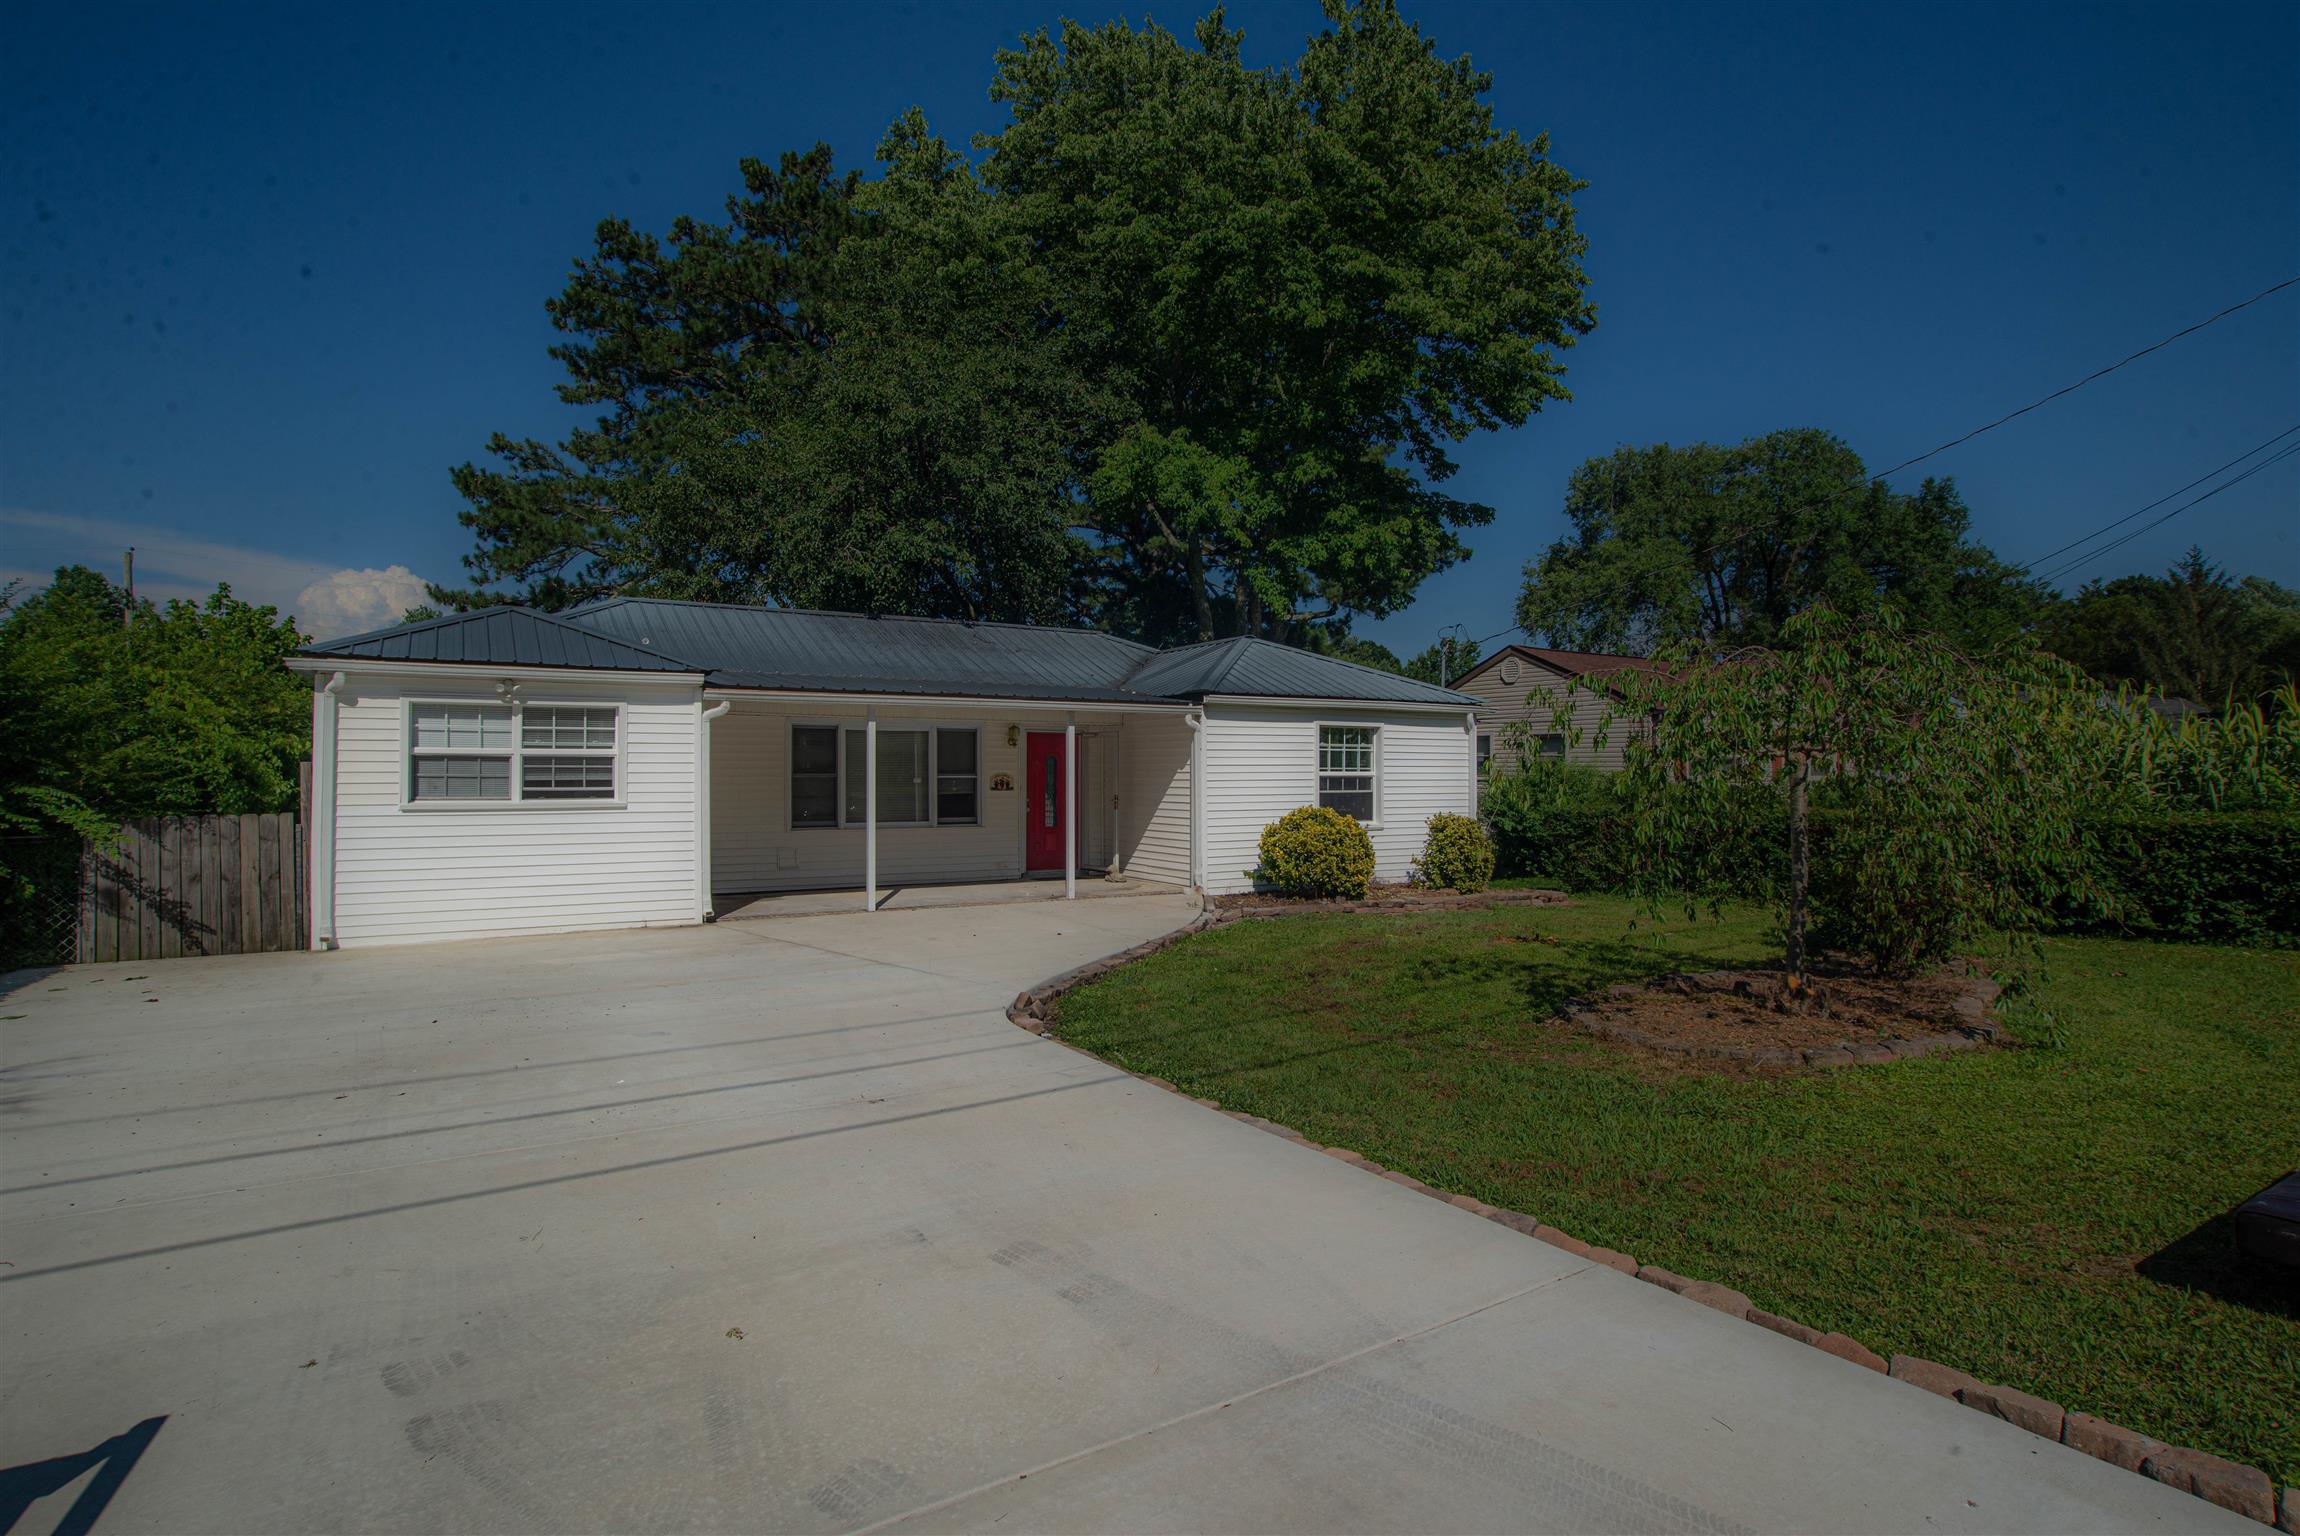 910 1St Ave, Tullahoma, TN 37388 - Tullahoma, TN real estate listing